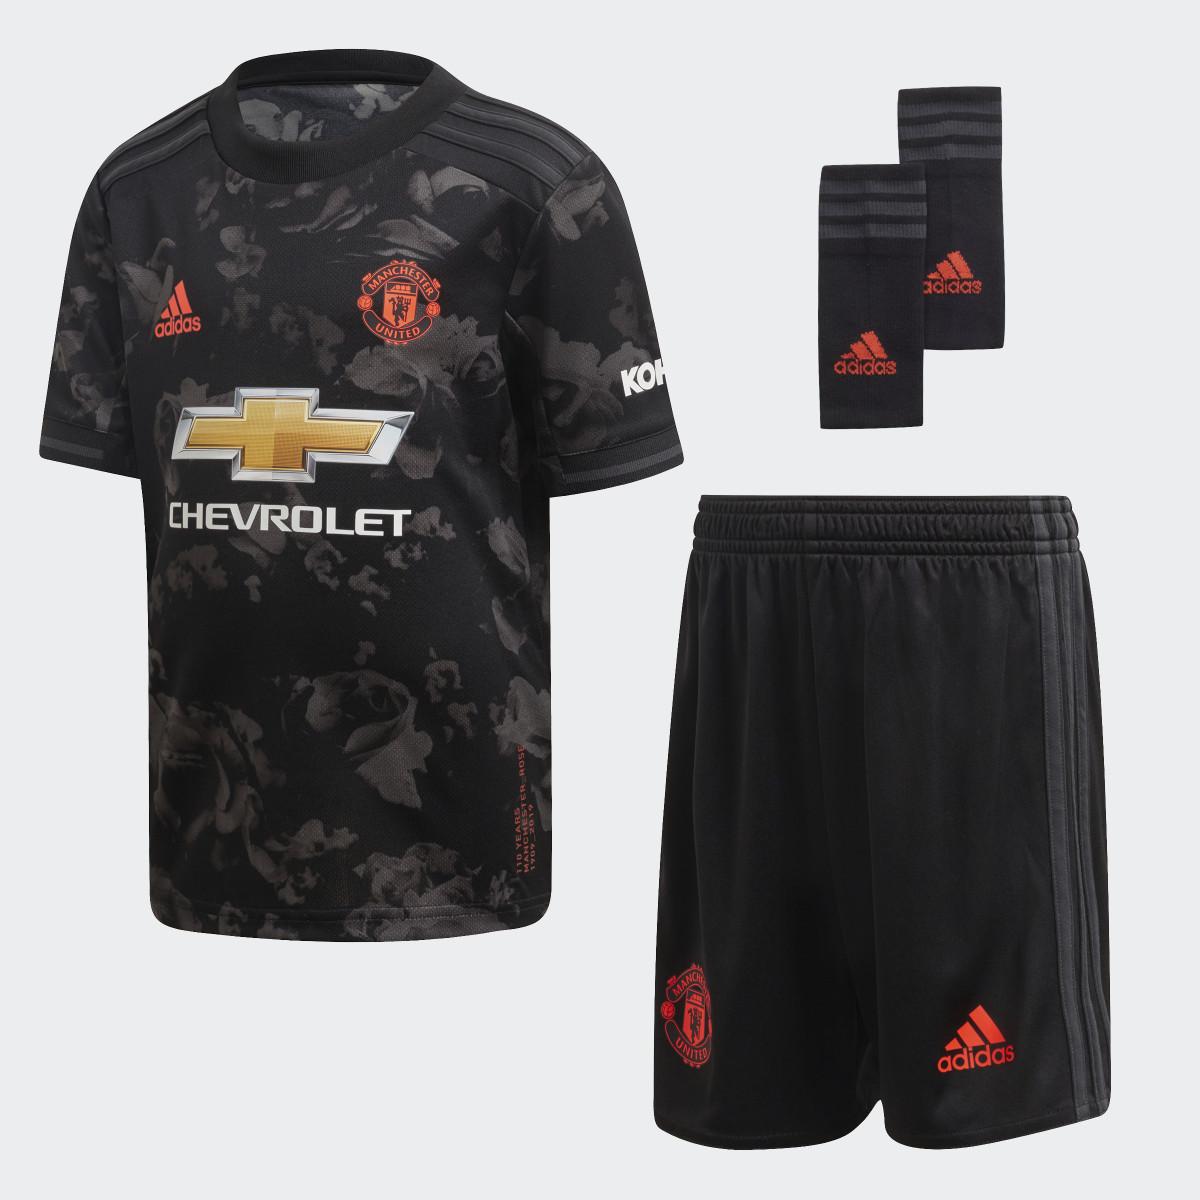 Mini Terceiro Equipamento do Manchester United